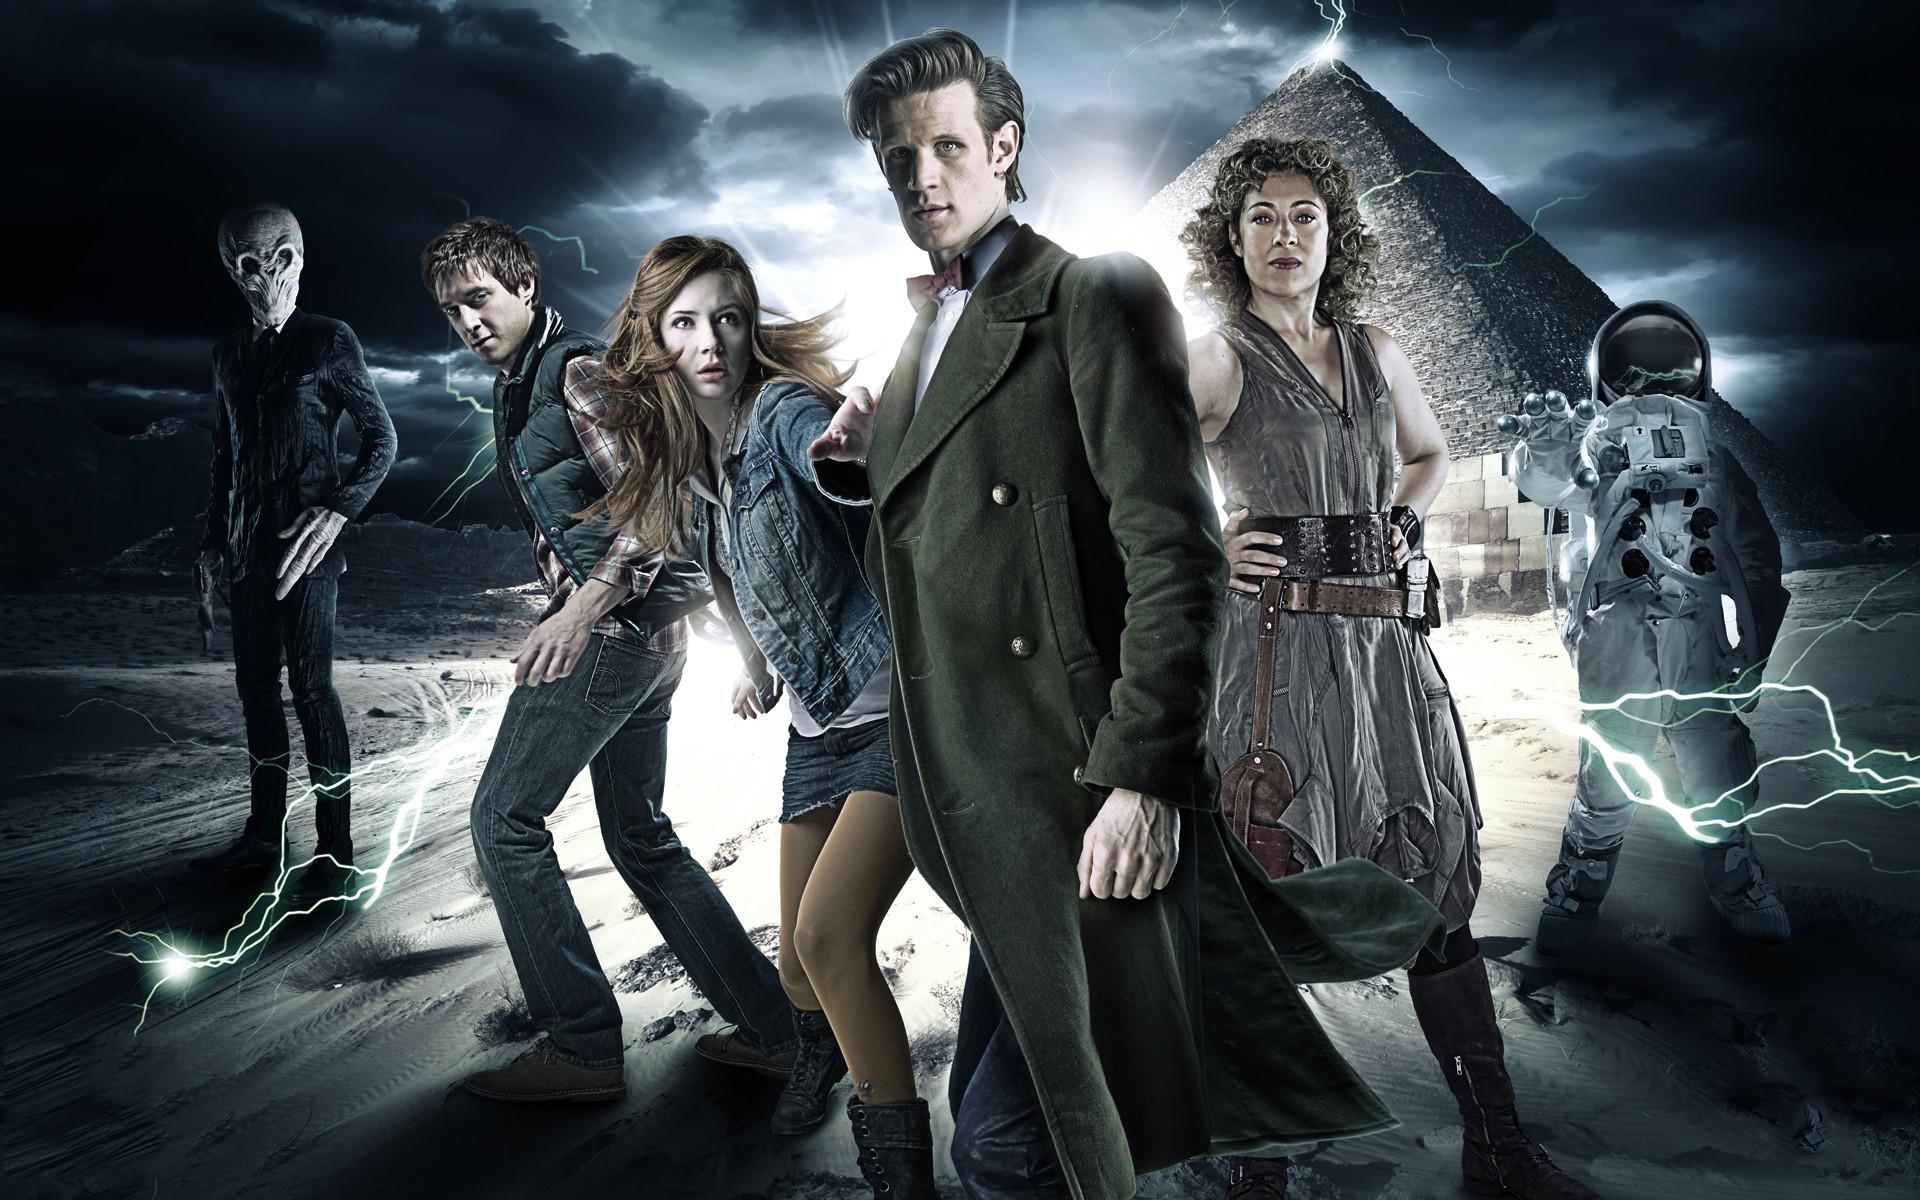 Matt Smith Eleventh Doctor Hd Wallpaper Background Image 1920x1200